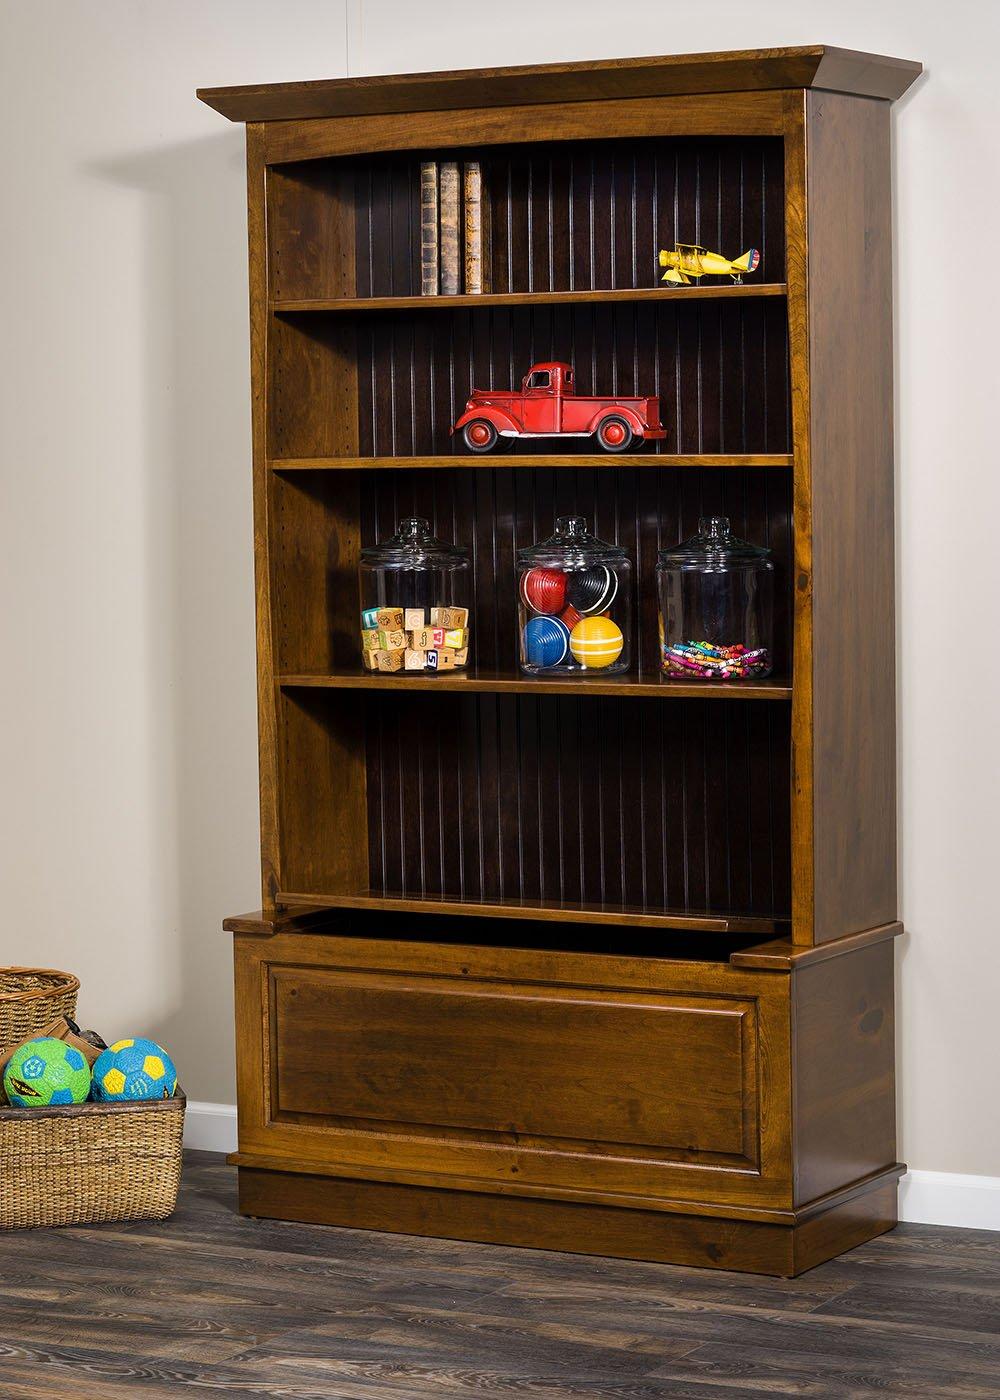 top ingenuity coaster round peerless dining mats corner white cupboard fine table room furniture